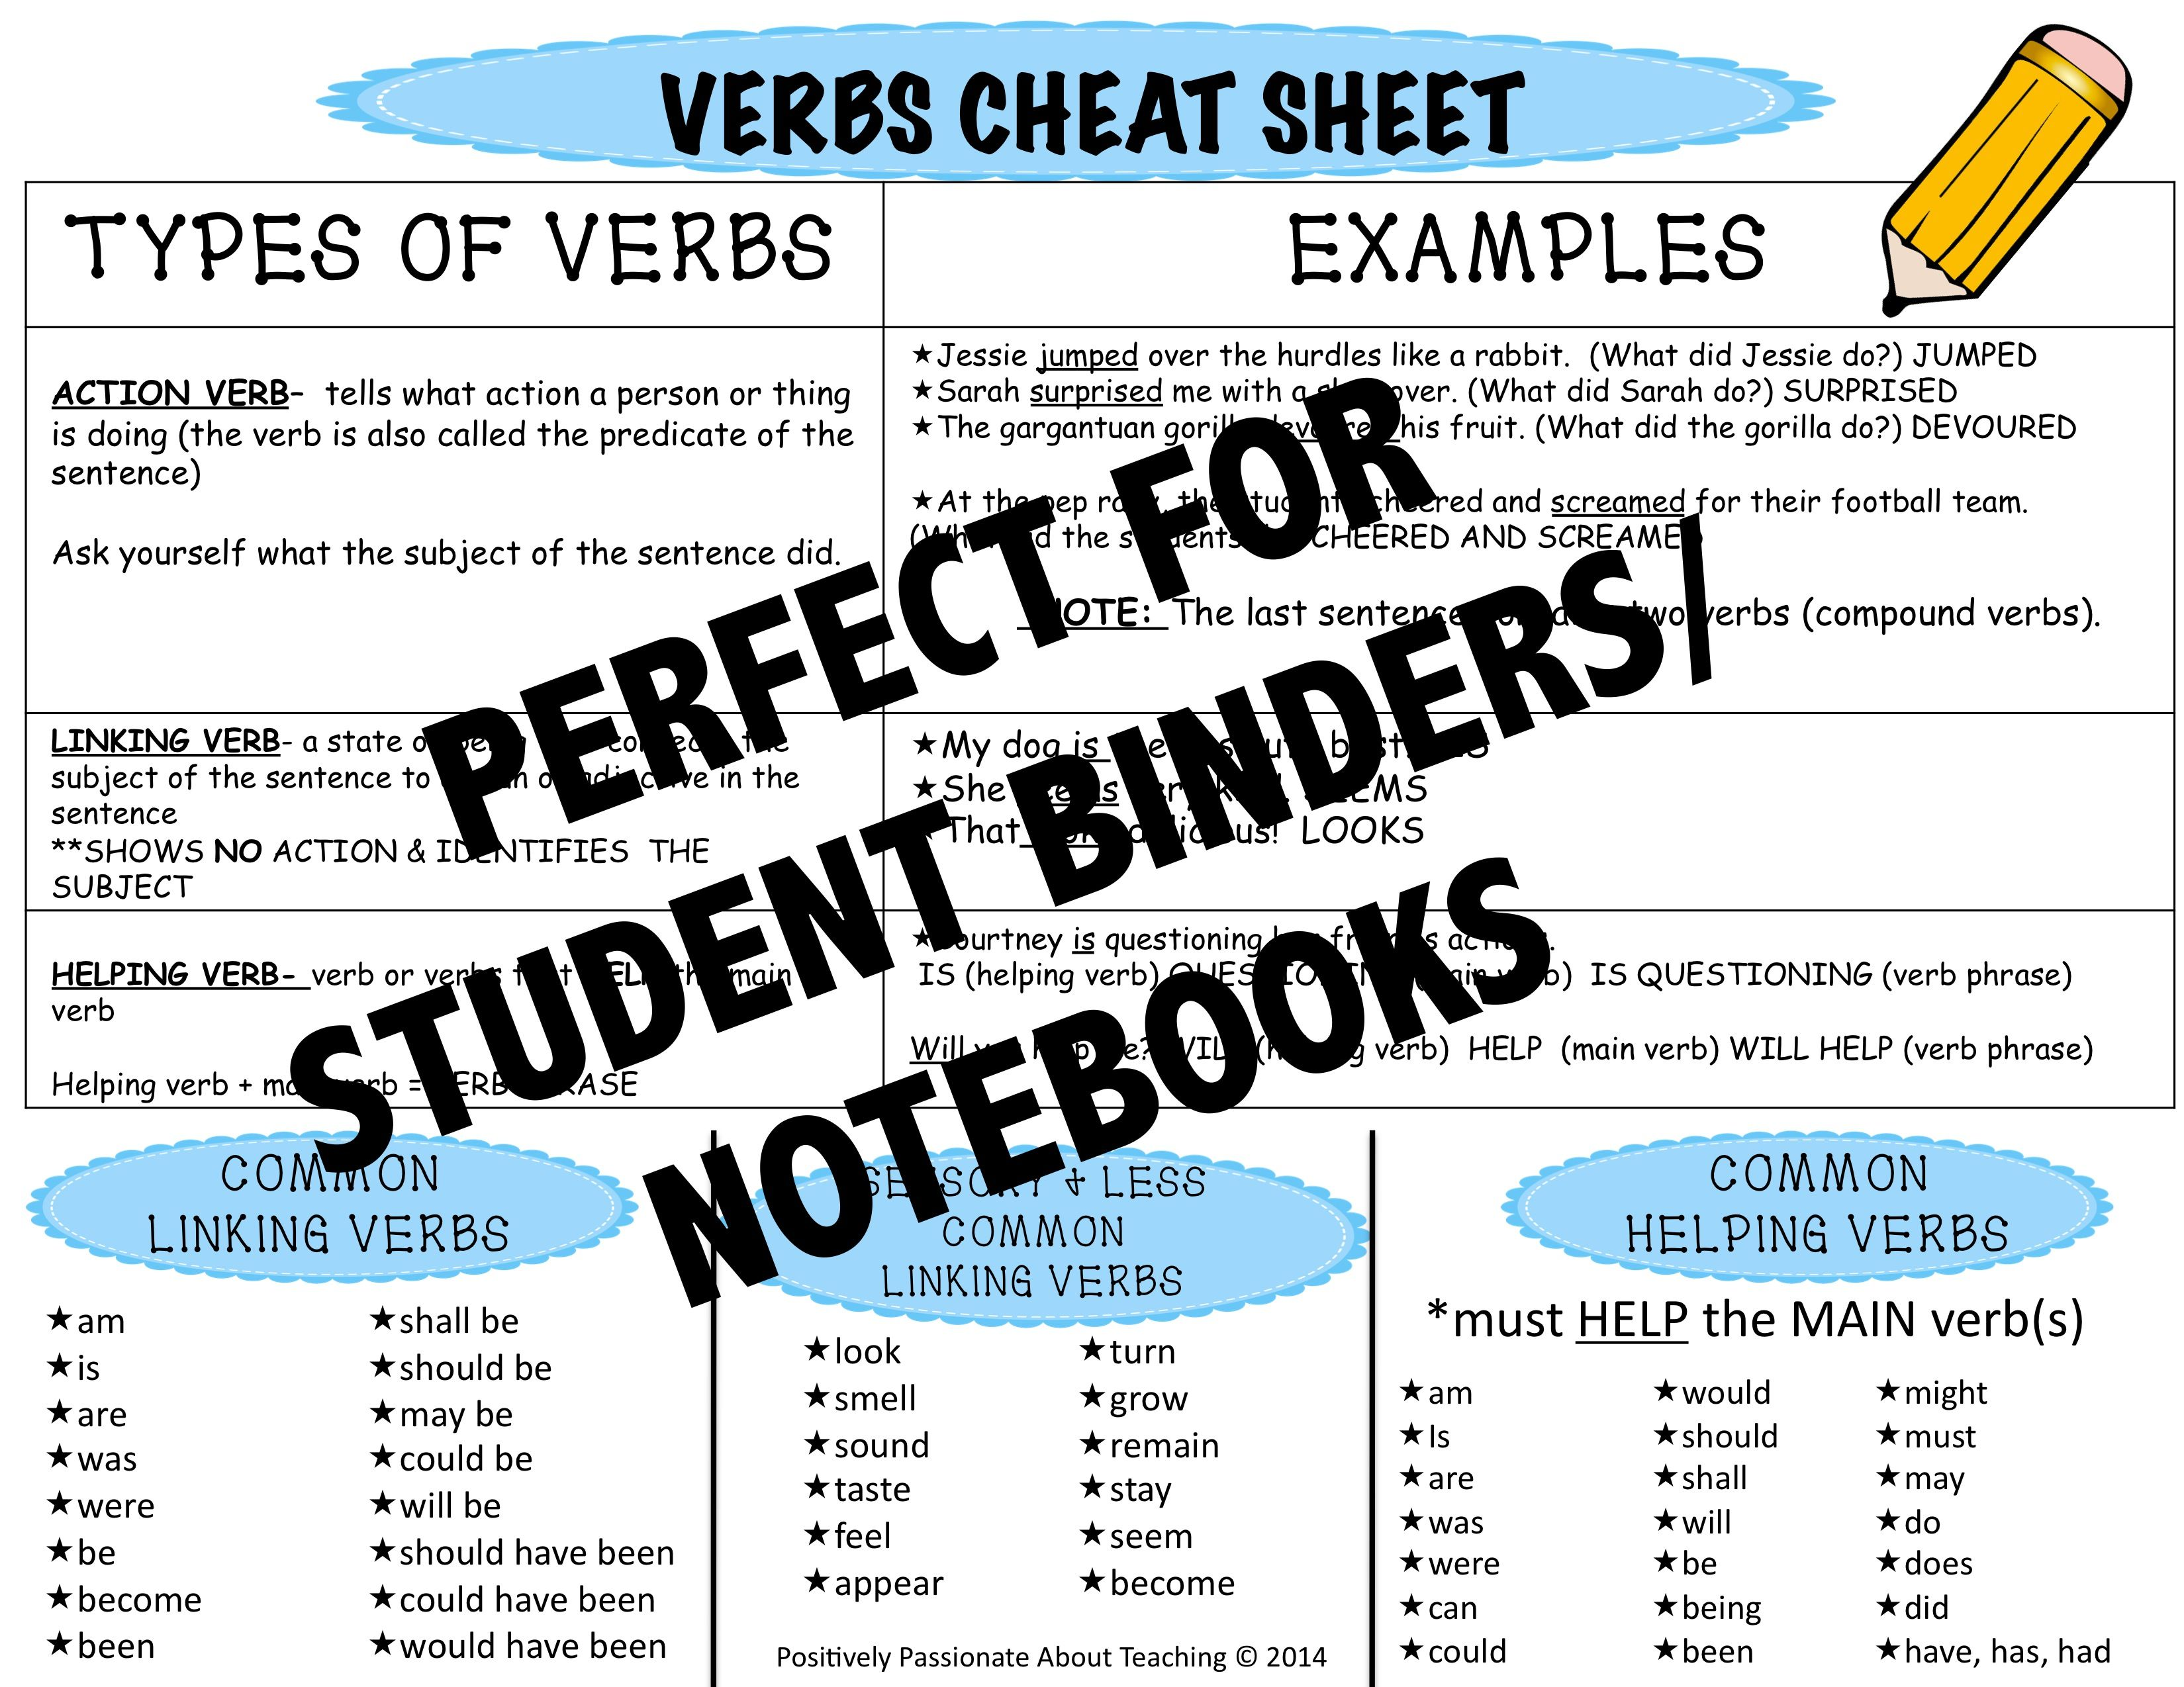 Verbs Cheat Sheet Grammar Resource For Interactive Notebooks Or Binders